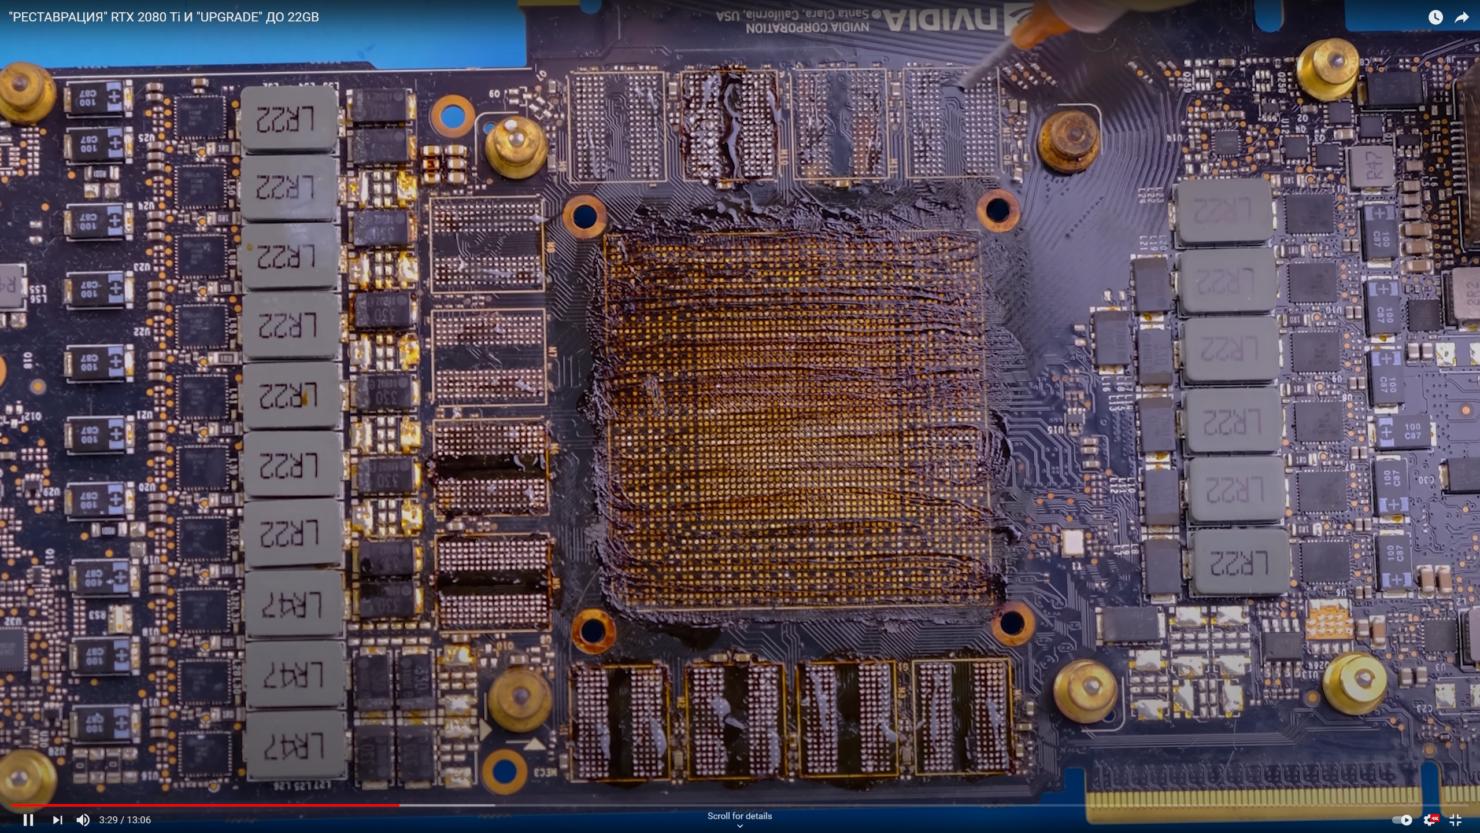 nvidia-geforce-rtx-2080-ti-22-gb-gddr6-graphics-card-mod-_2-custom